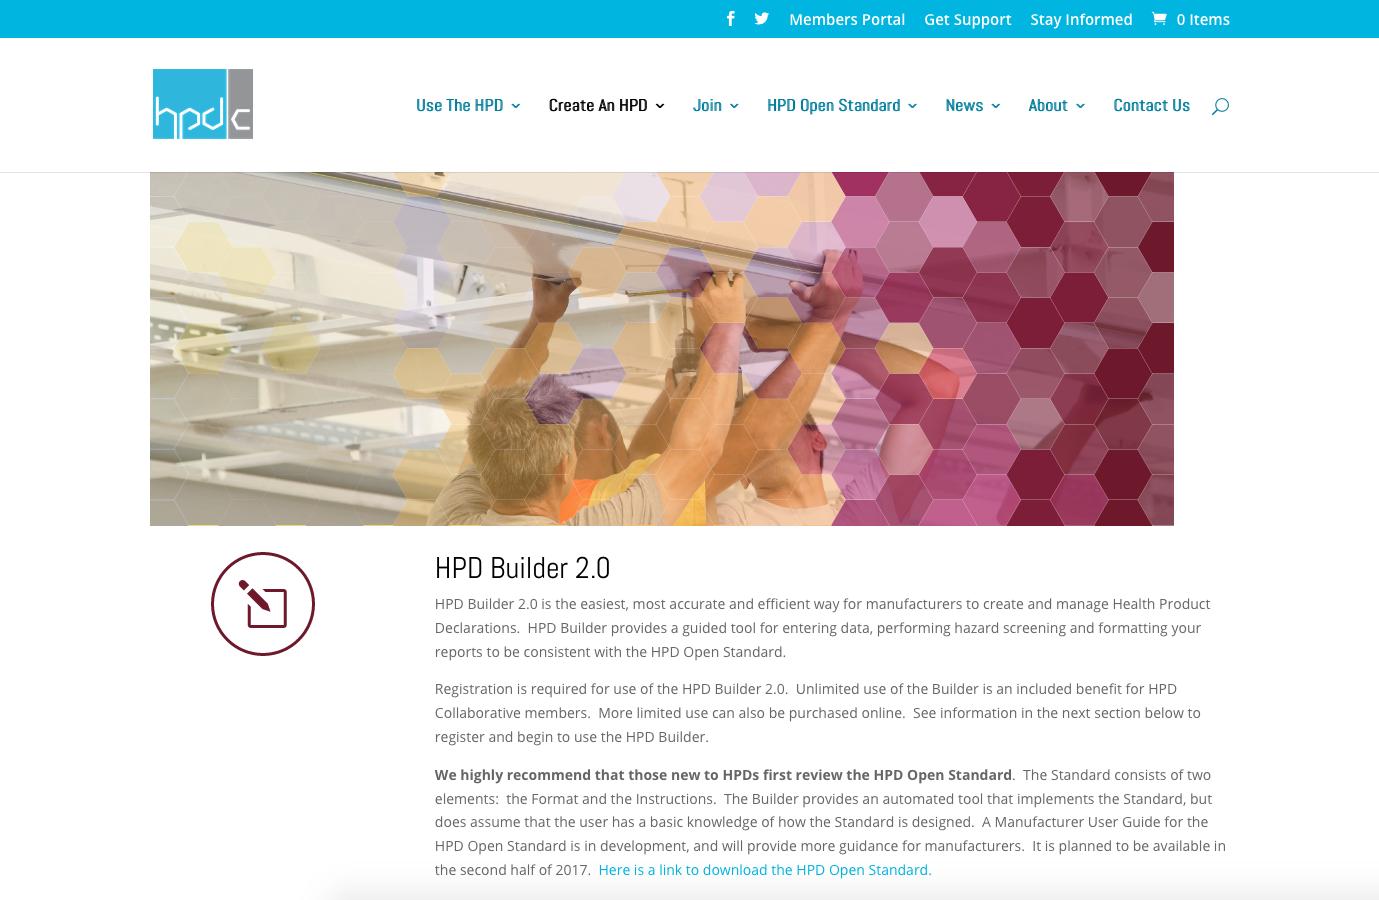 HPDC_Interior2